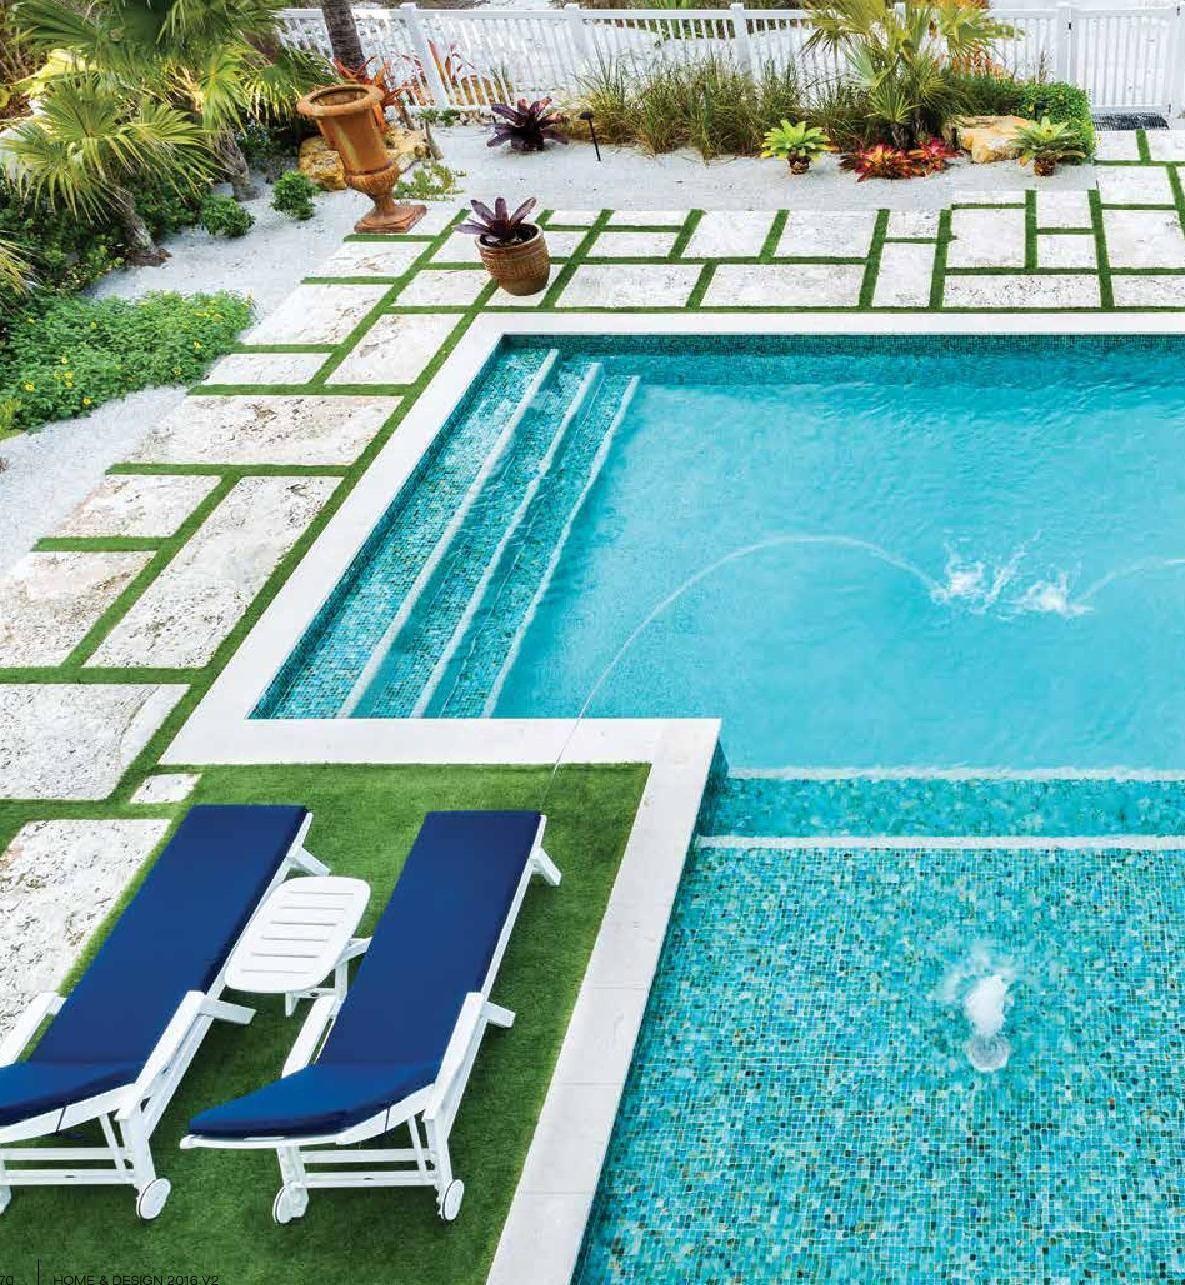 Home & Design Magazine 2016 Suncoast Florida Edition in 2019 ...